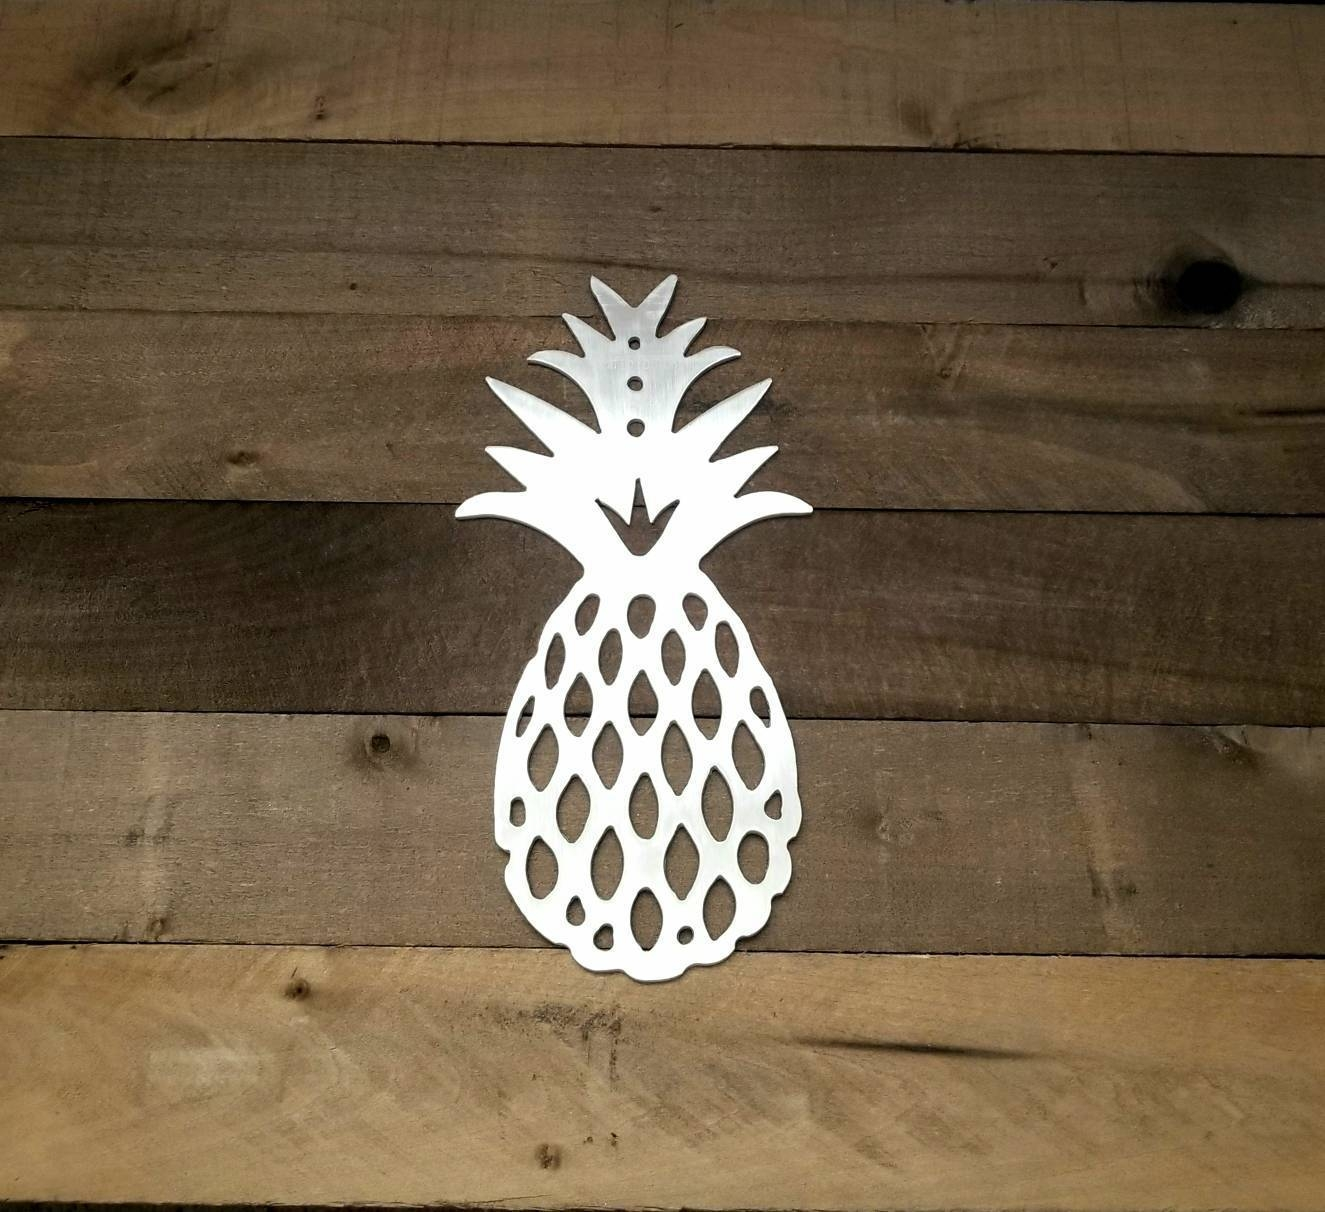 Metal Pineapple Wall Art Hawaii Pineapple Decoration In 2017 Pineapple Metal Wall Art (View 12 of 20)